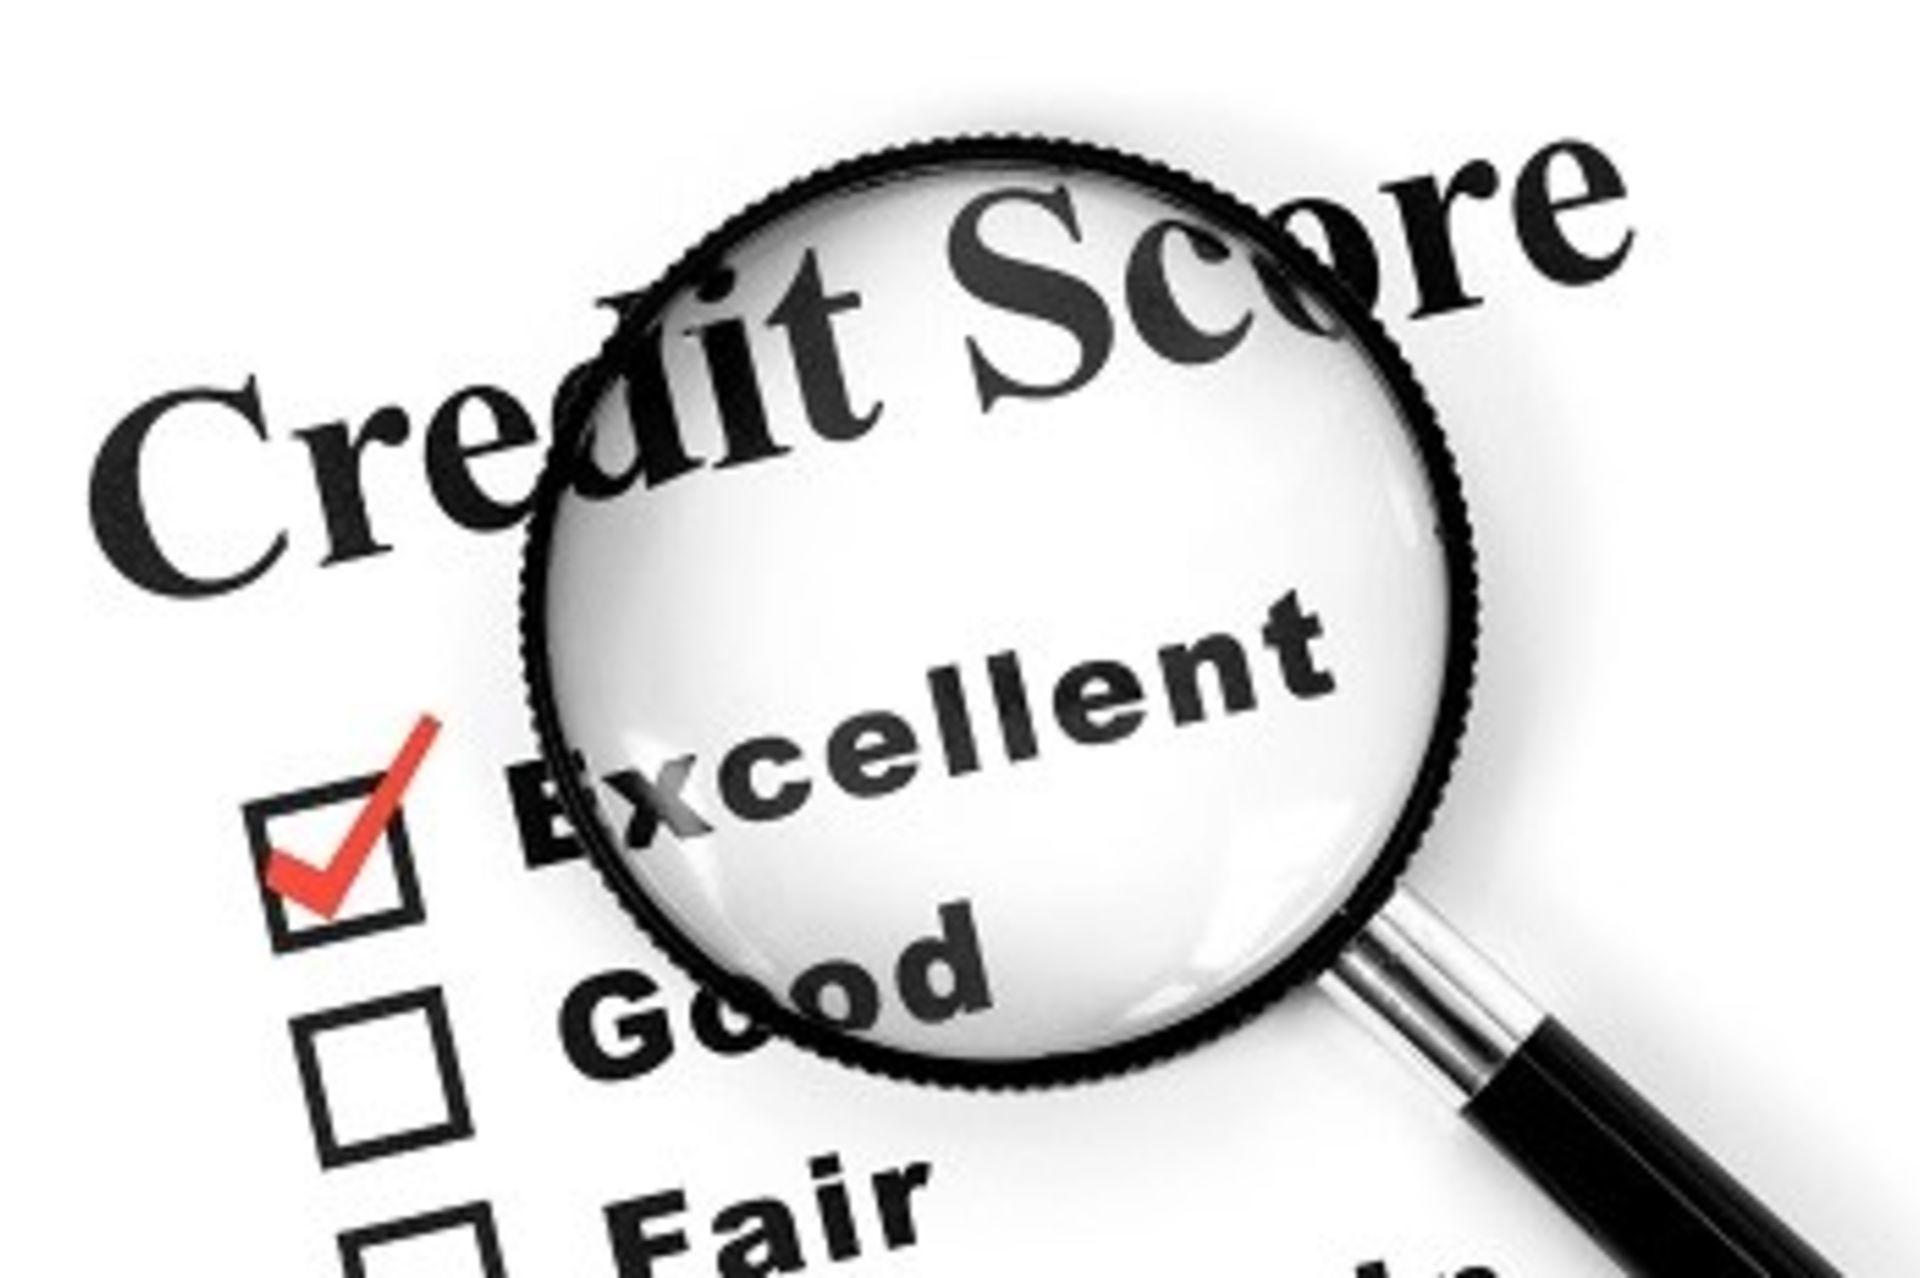 Weekly Credit Tip: Types of Credit